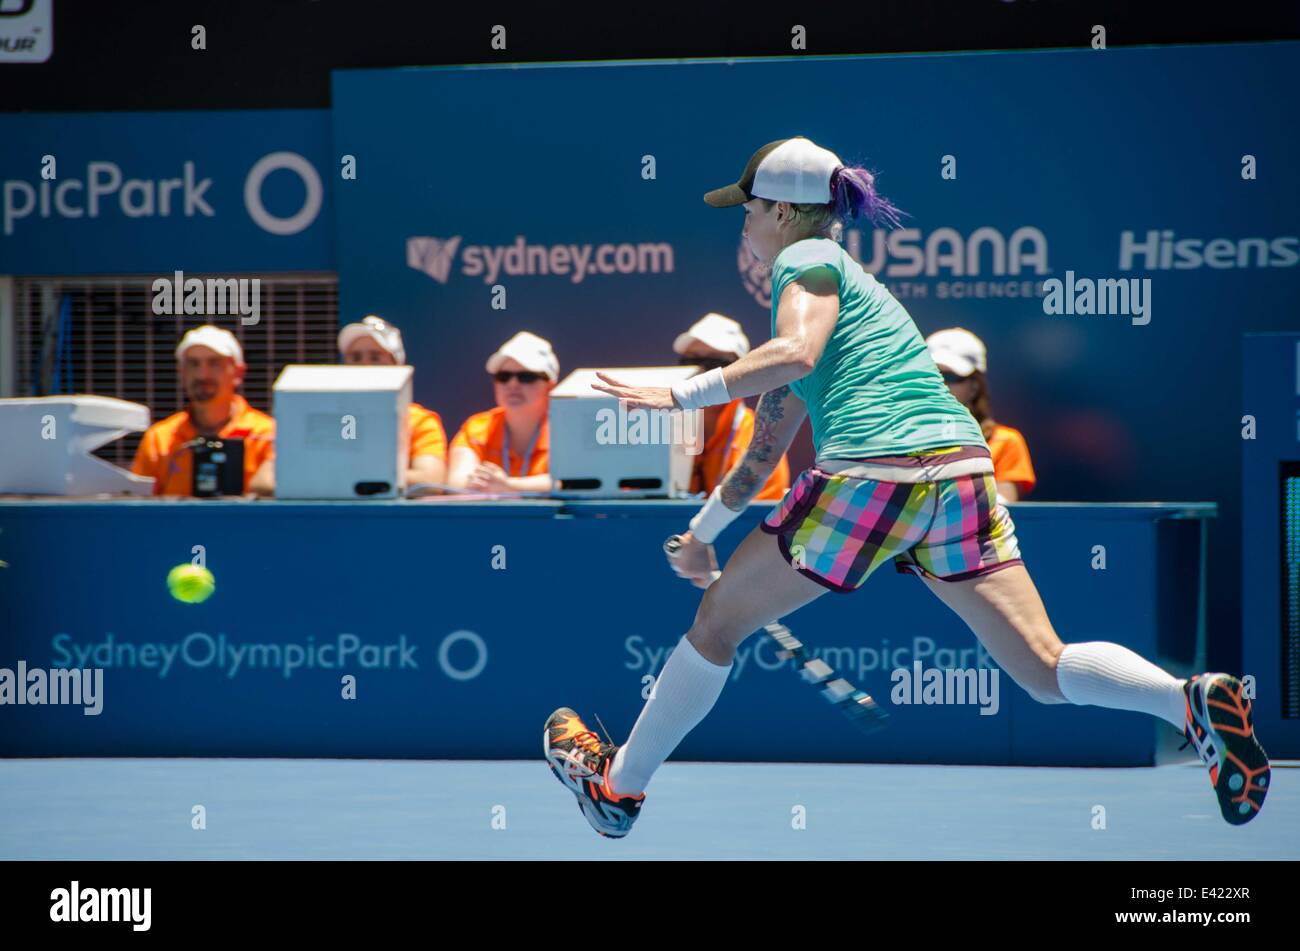 Apia International Sydney Tennis Tournament